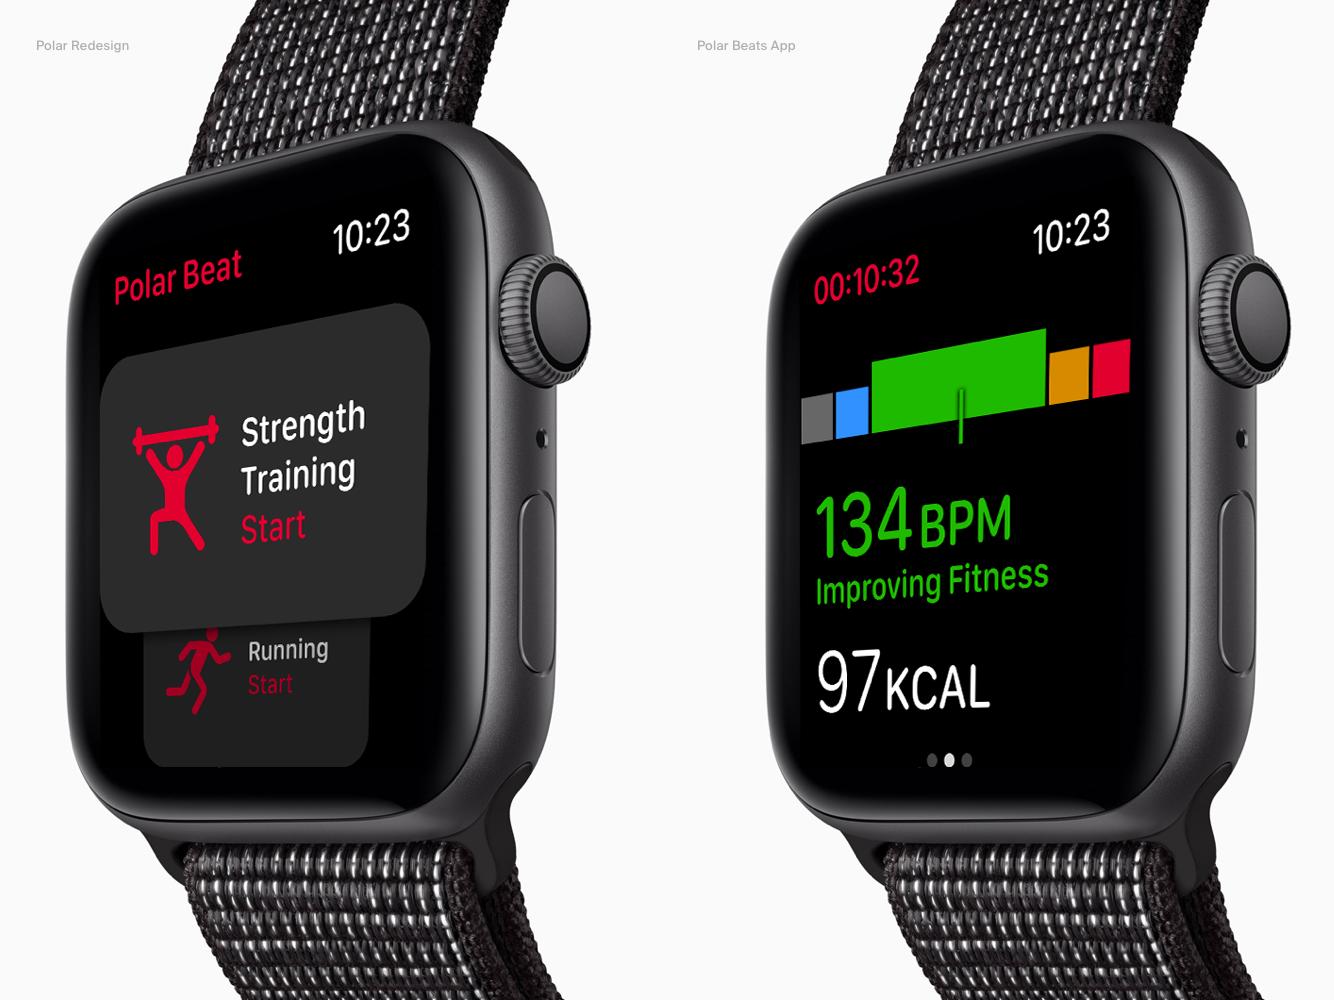 Polar Beats for Apple Watch by Roland Hidvegi on Dribbble